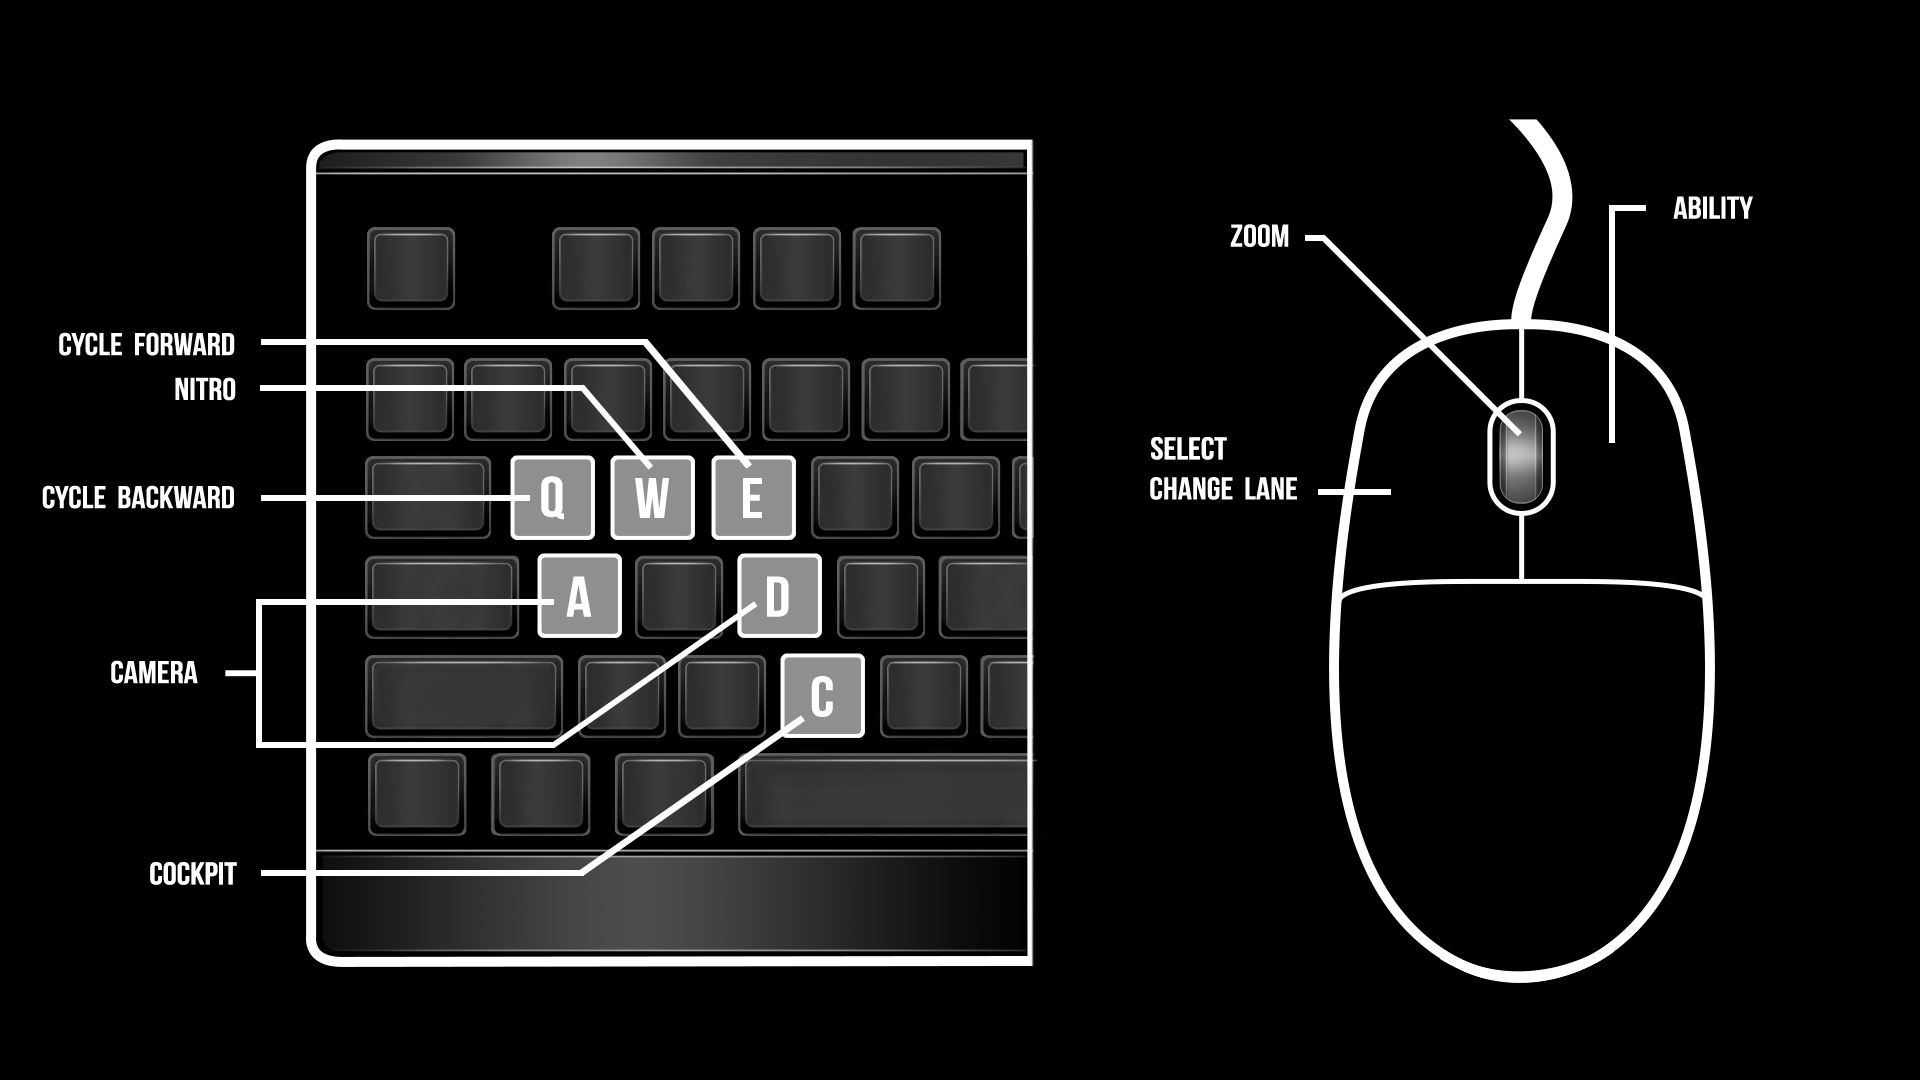 Controls_Schemes_Keyboard_English.png